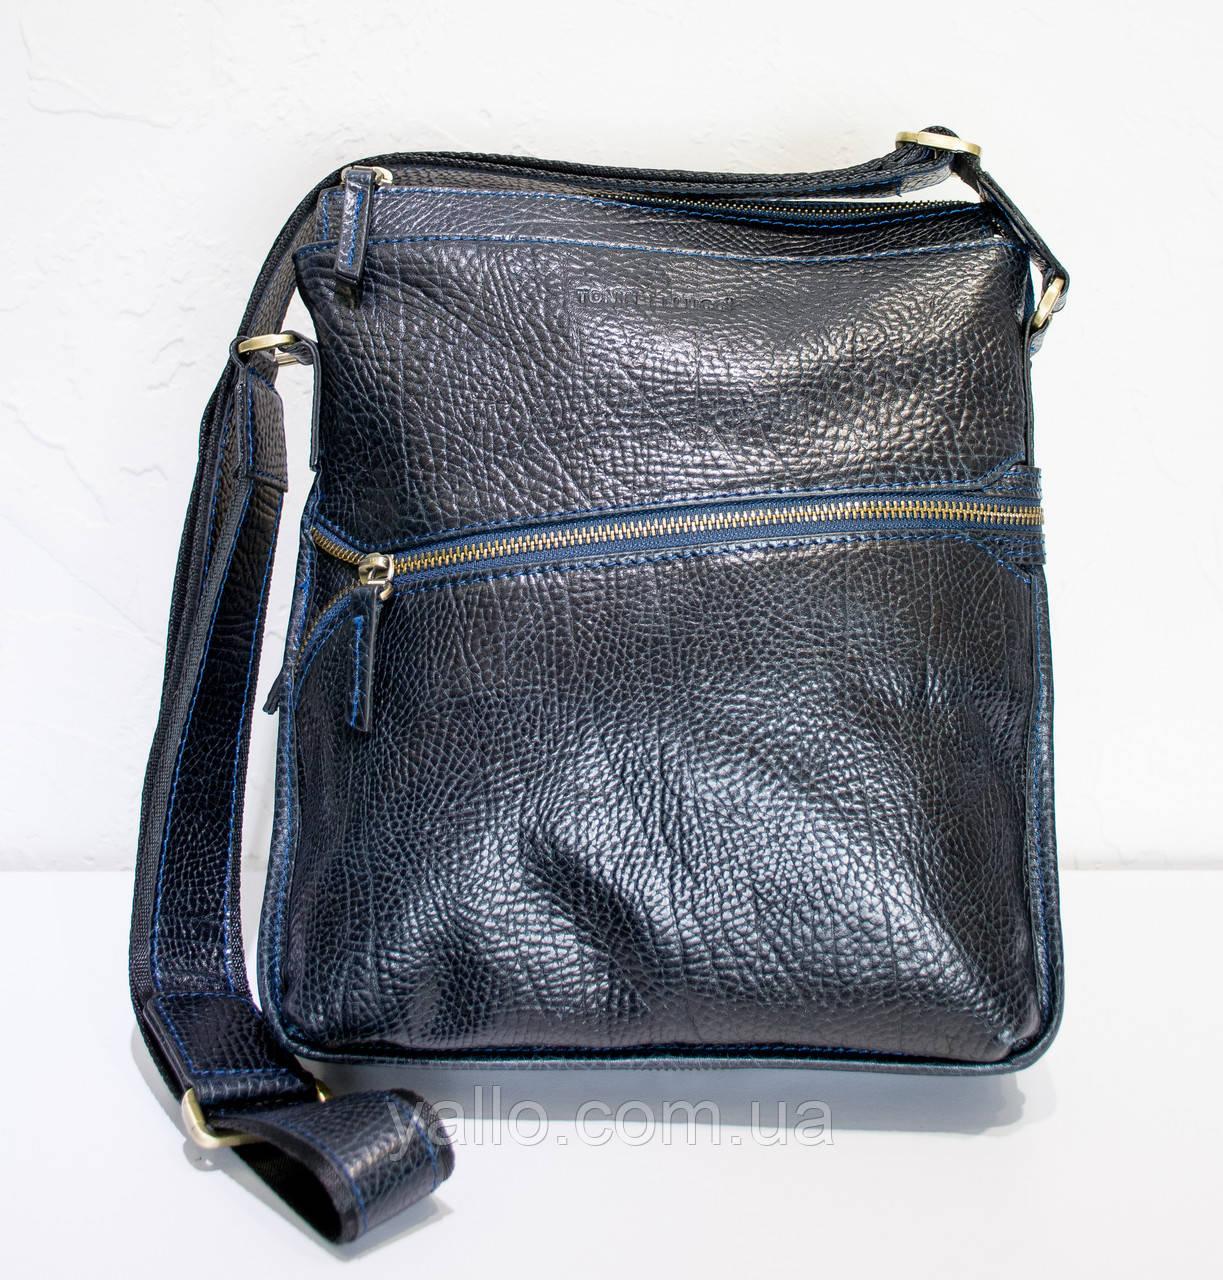 Натуральная кожаная сумка для мужчин Tony Bellucci T5029-894